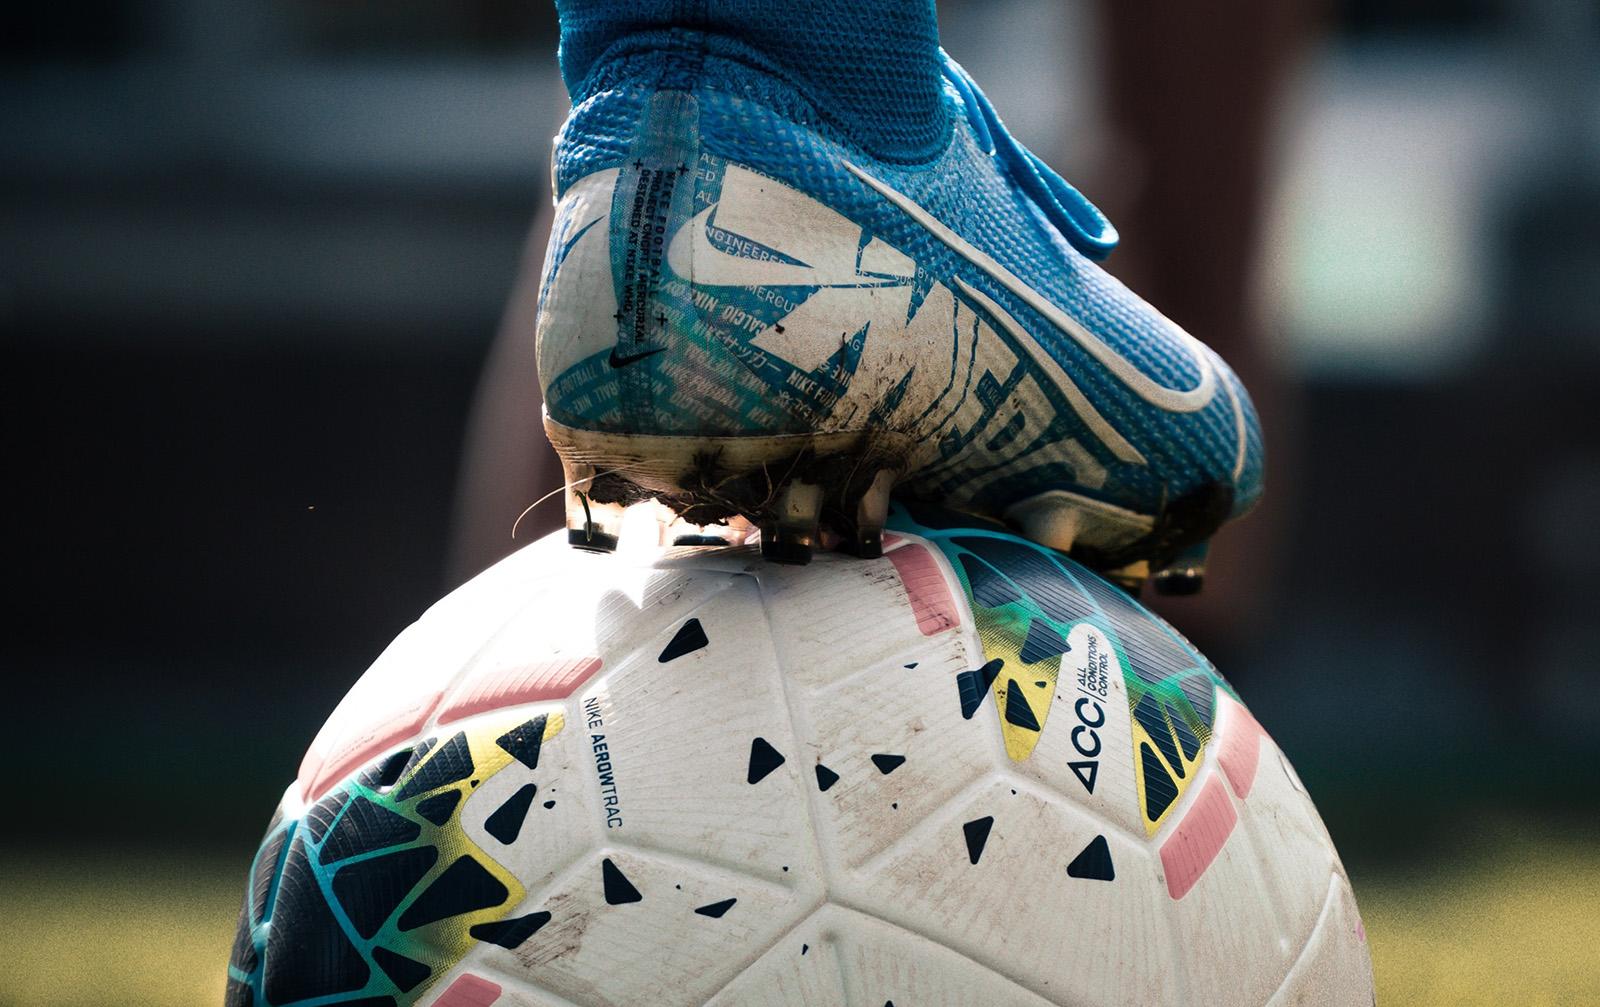 Fotboll under en pandemi